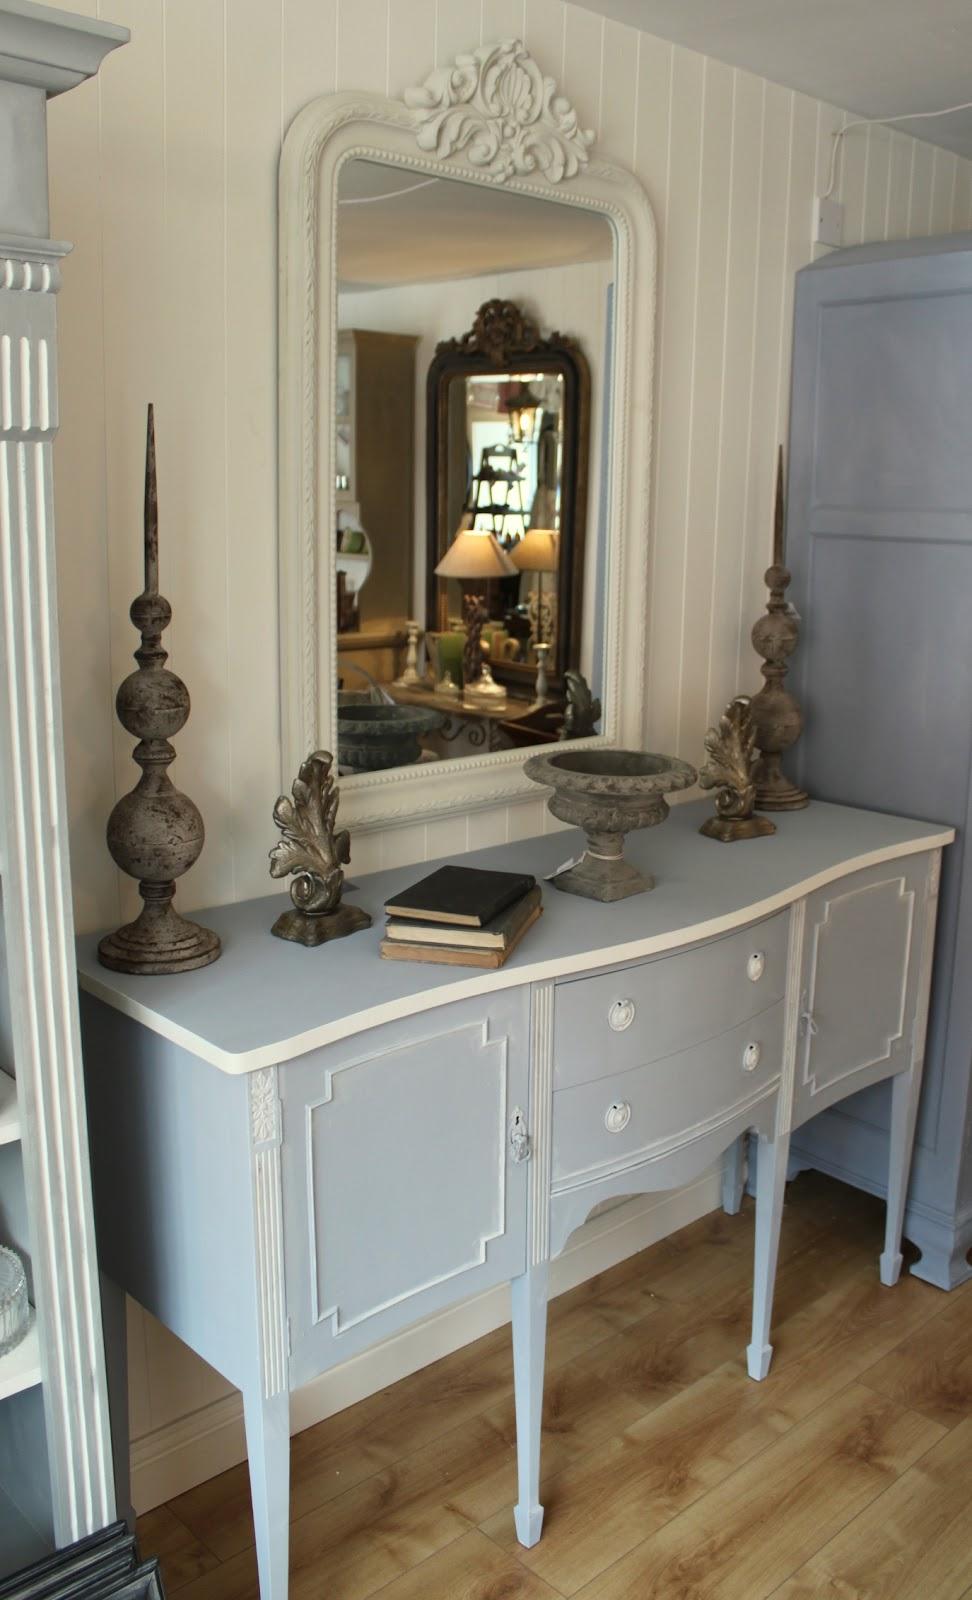 La vie en rose furniture painted in annie sloan chalk paint for Furniture paint